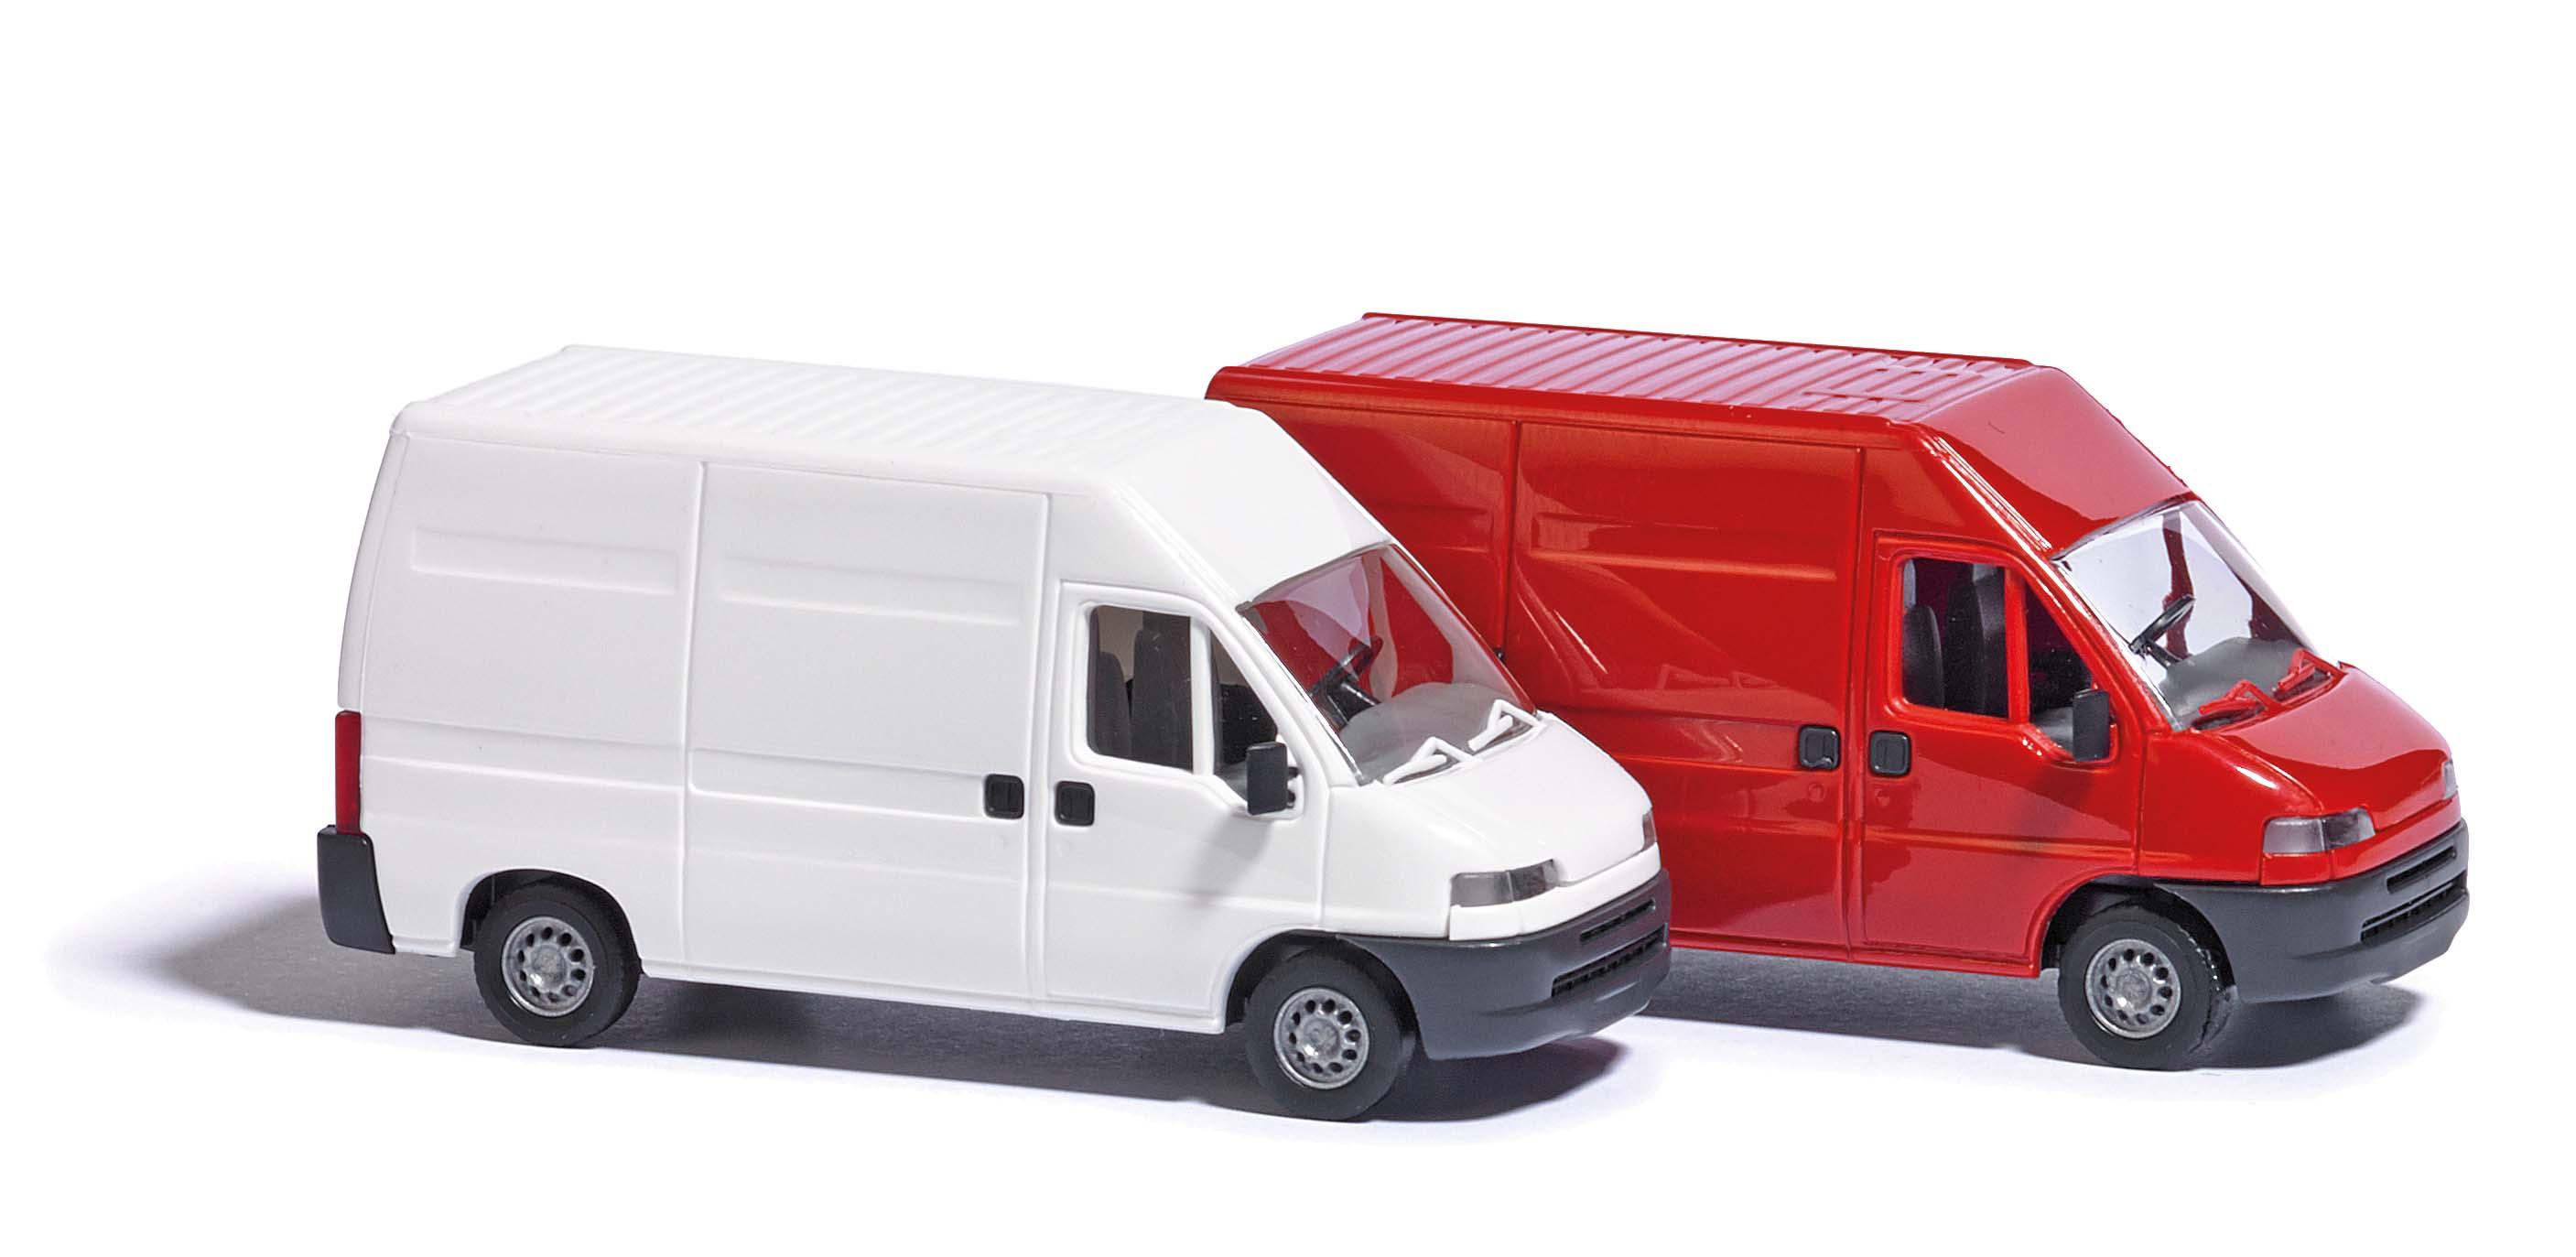 busch autos 89113 fiat ducato rot menzels lokschuppen onlineshop. Black Bedroom Furniture Sets. Home Design Ideas